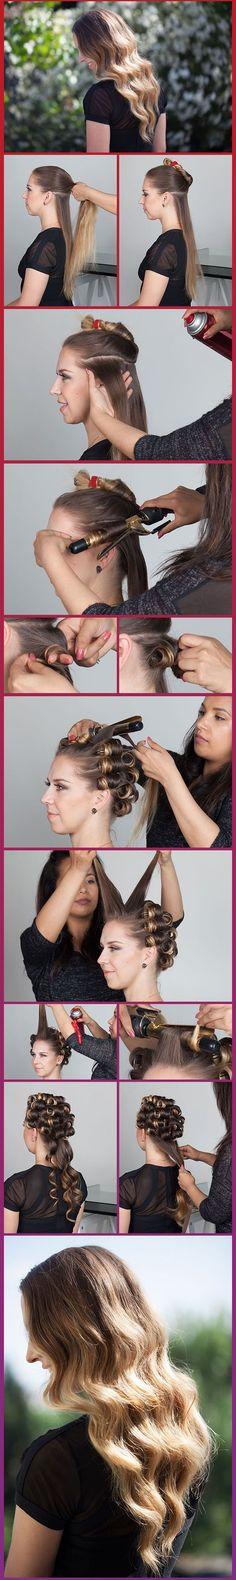 How To Fake a Fishbone Braid